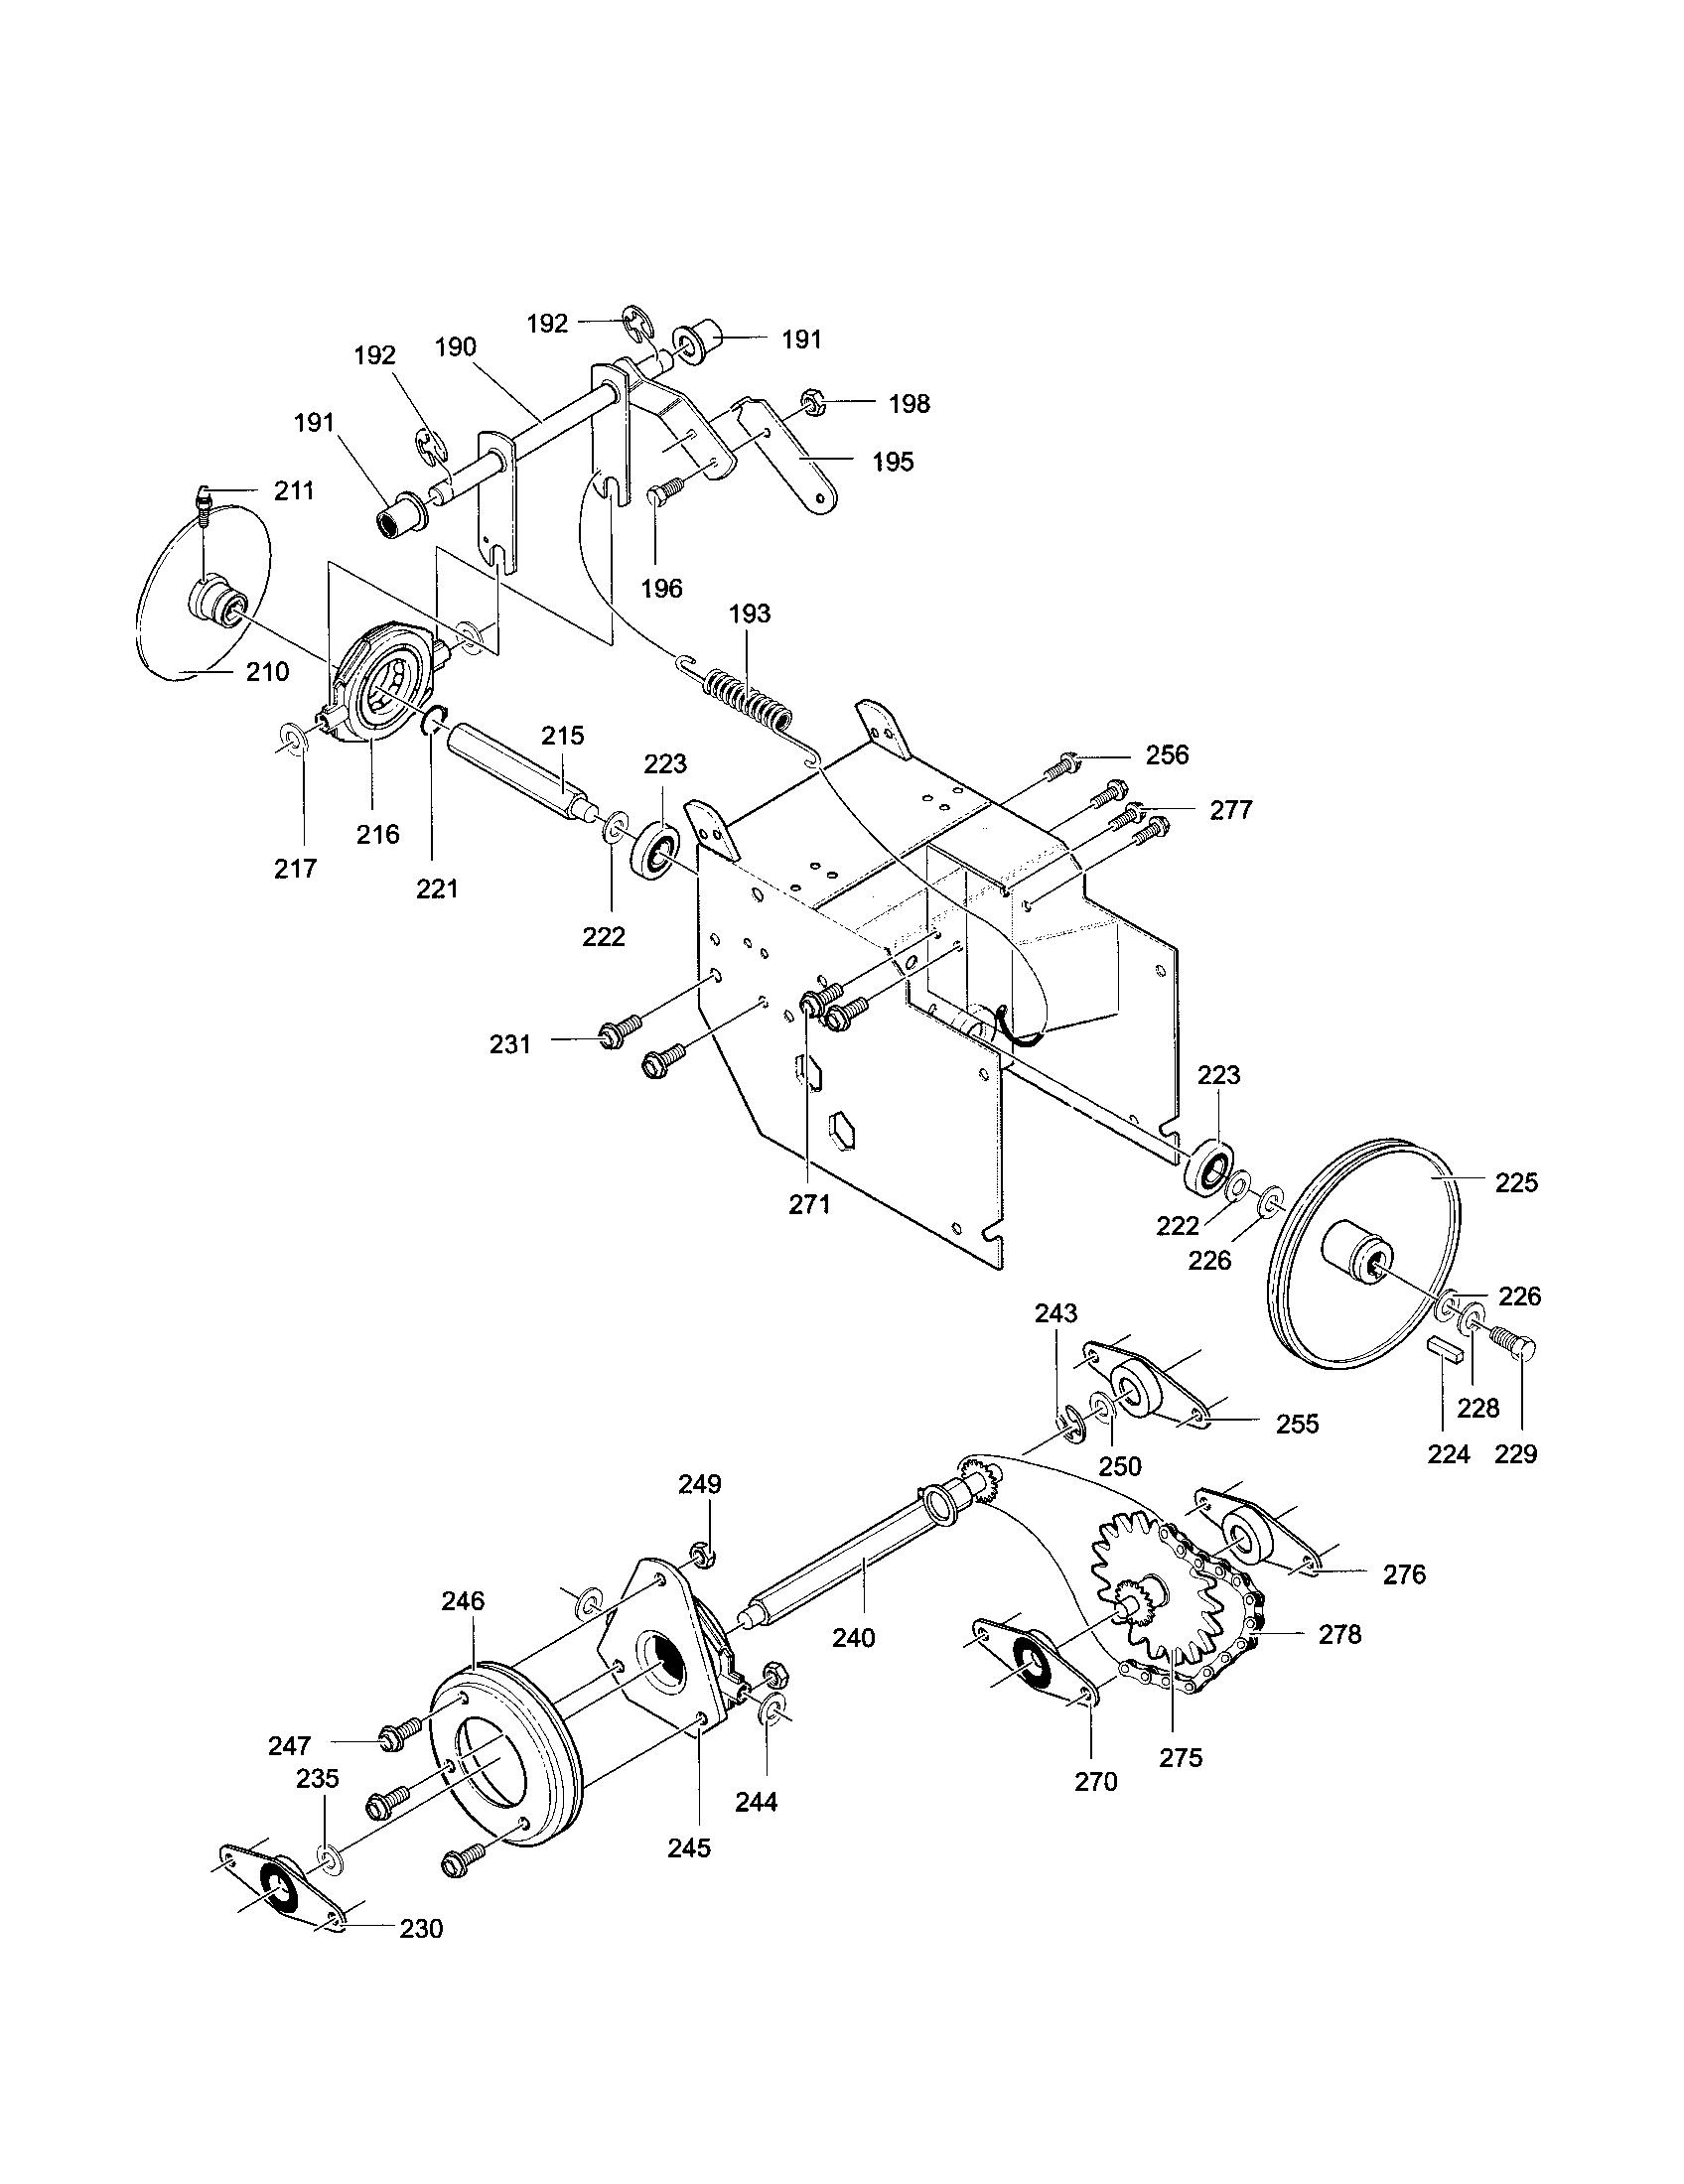 DRIVE COMPONENTS Diagram & Parts List for Model C950520050